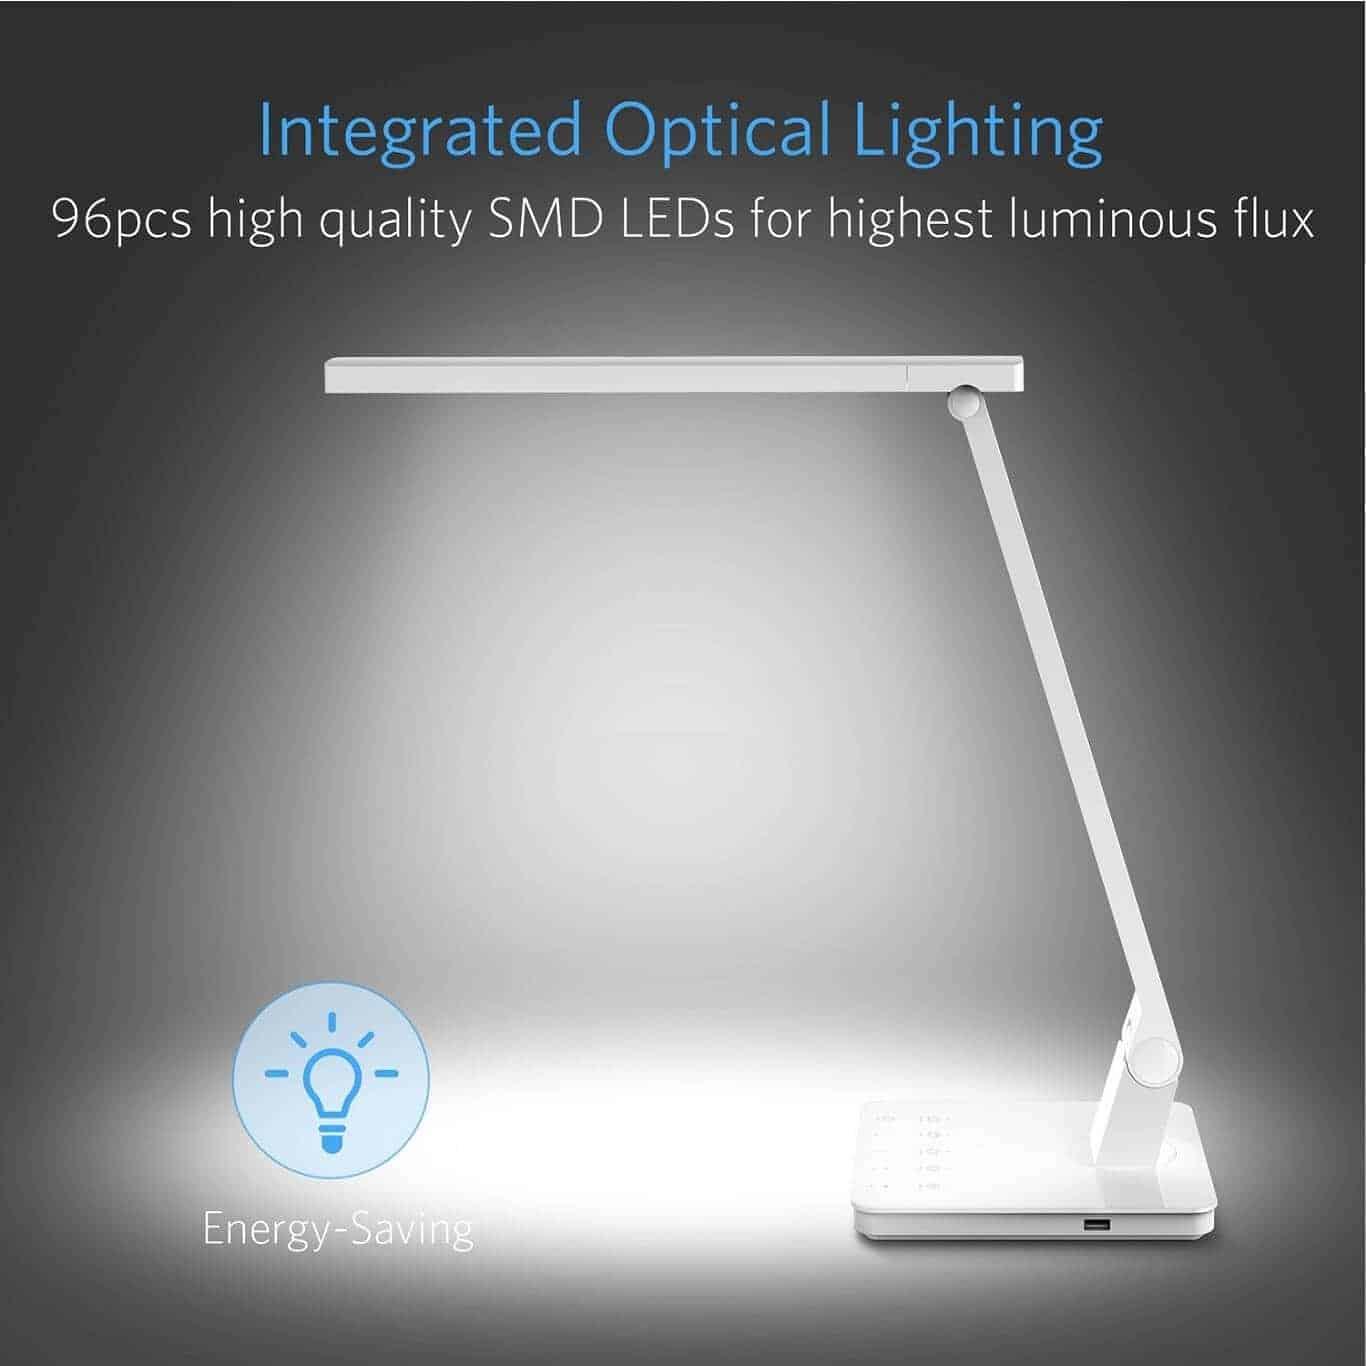 LED Dimmable Desk Lamp by BESTEK 03